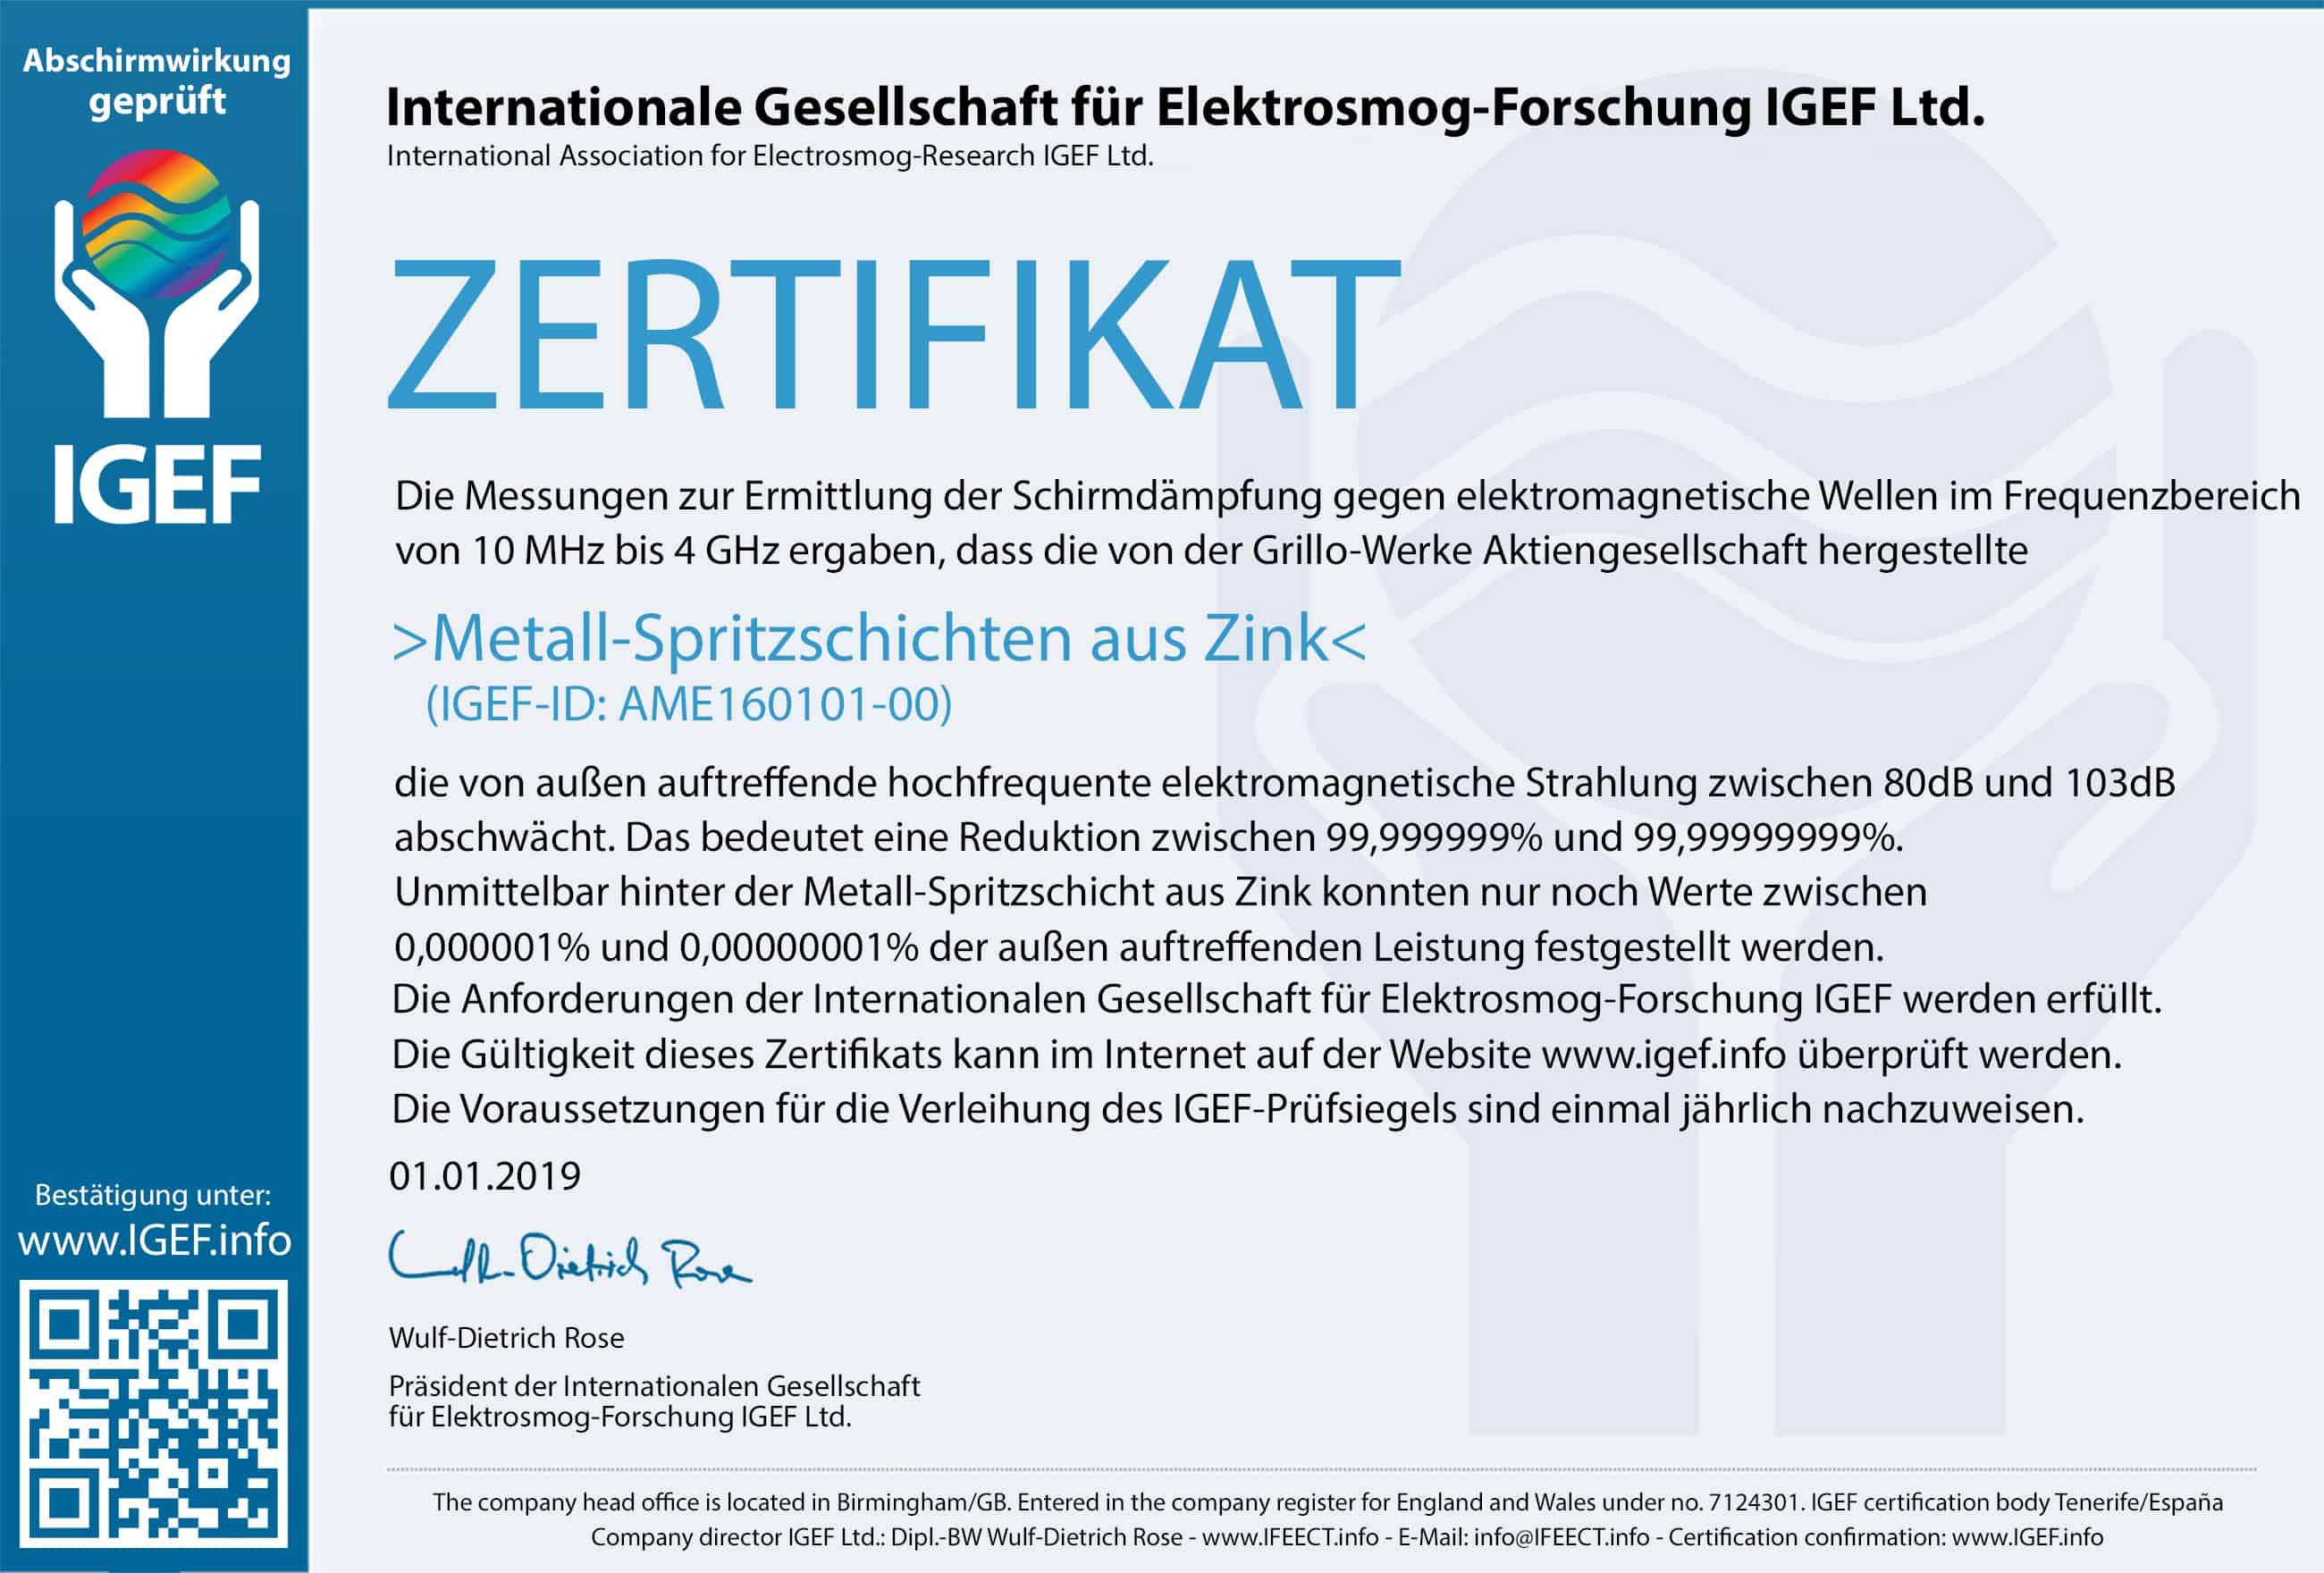 IGEF-Zertifikat-AME-DE-19